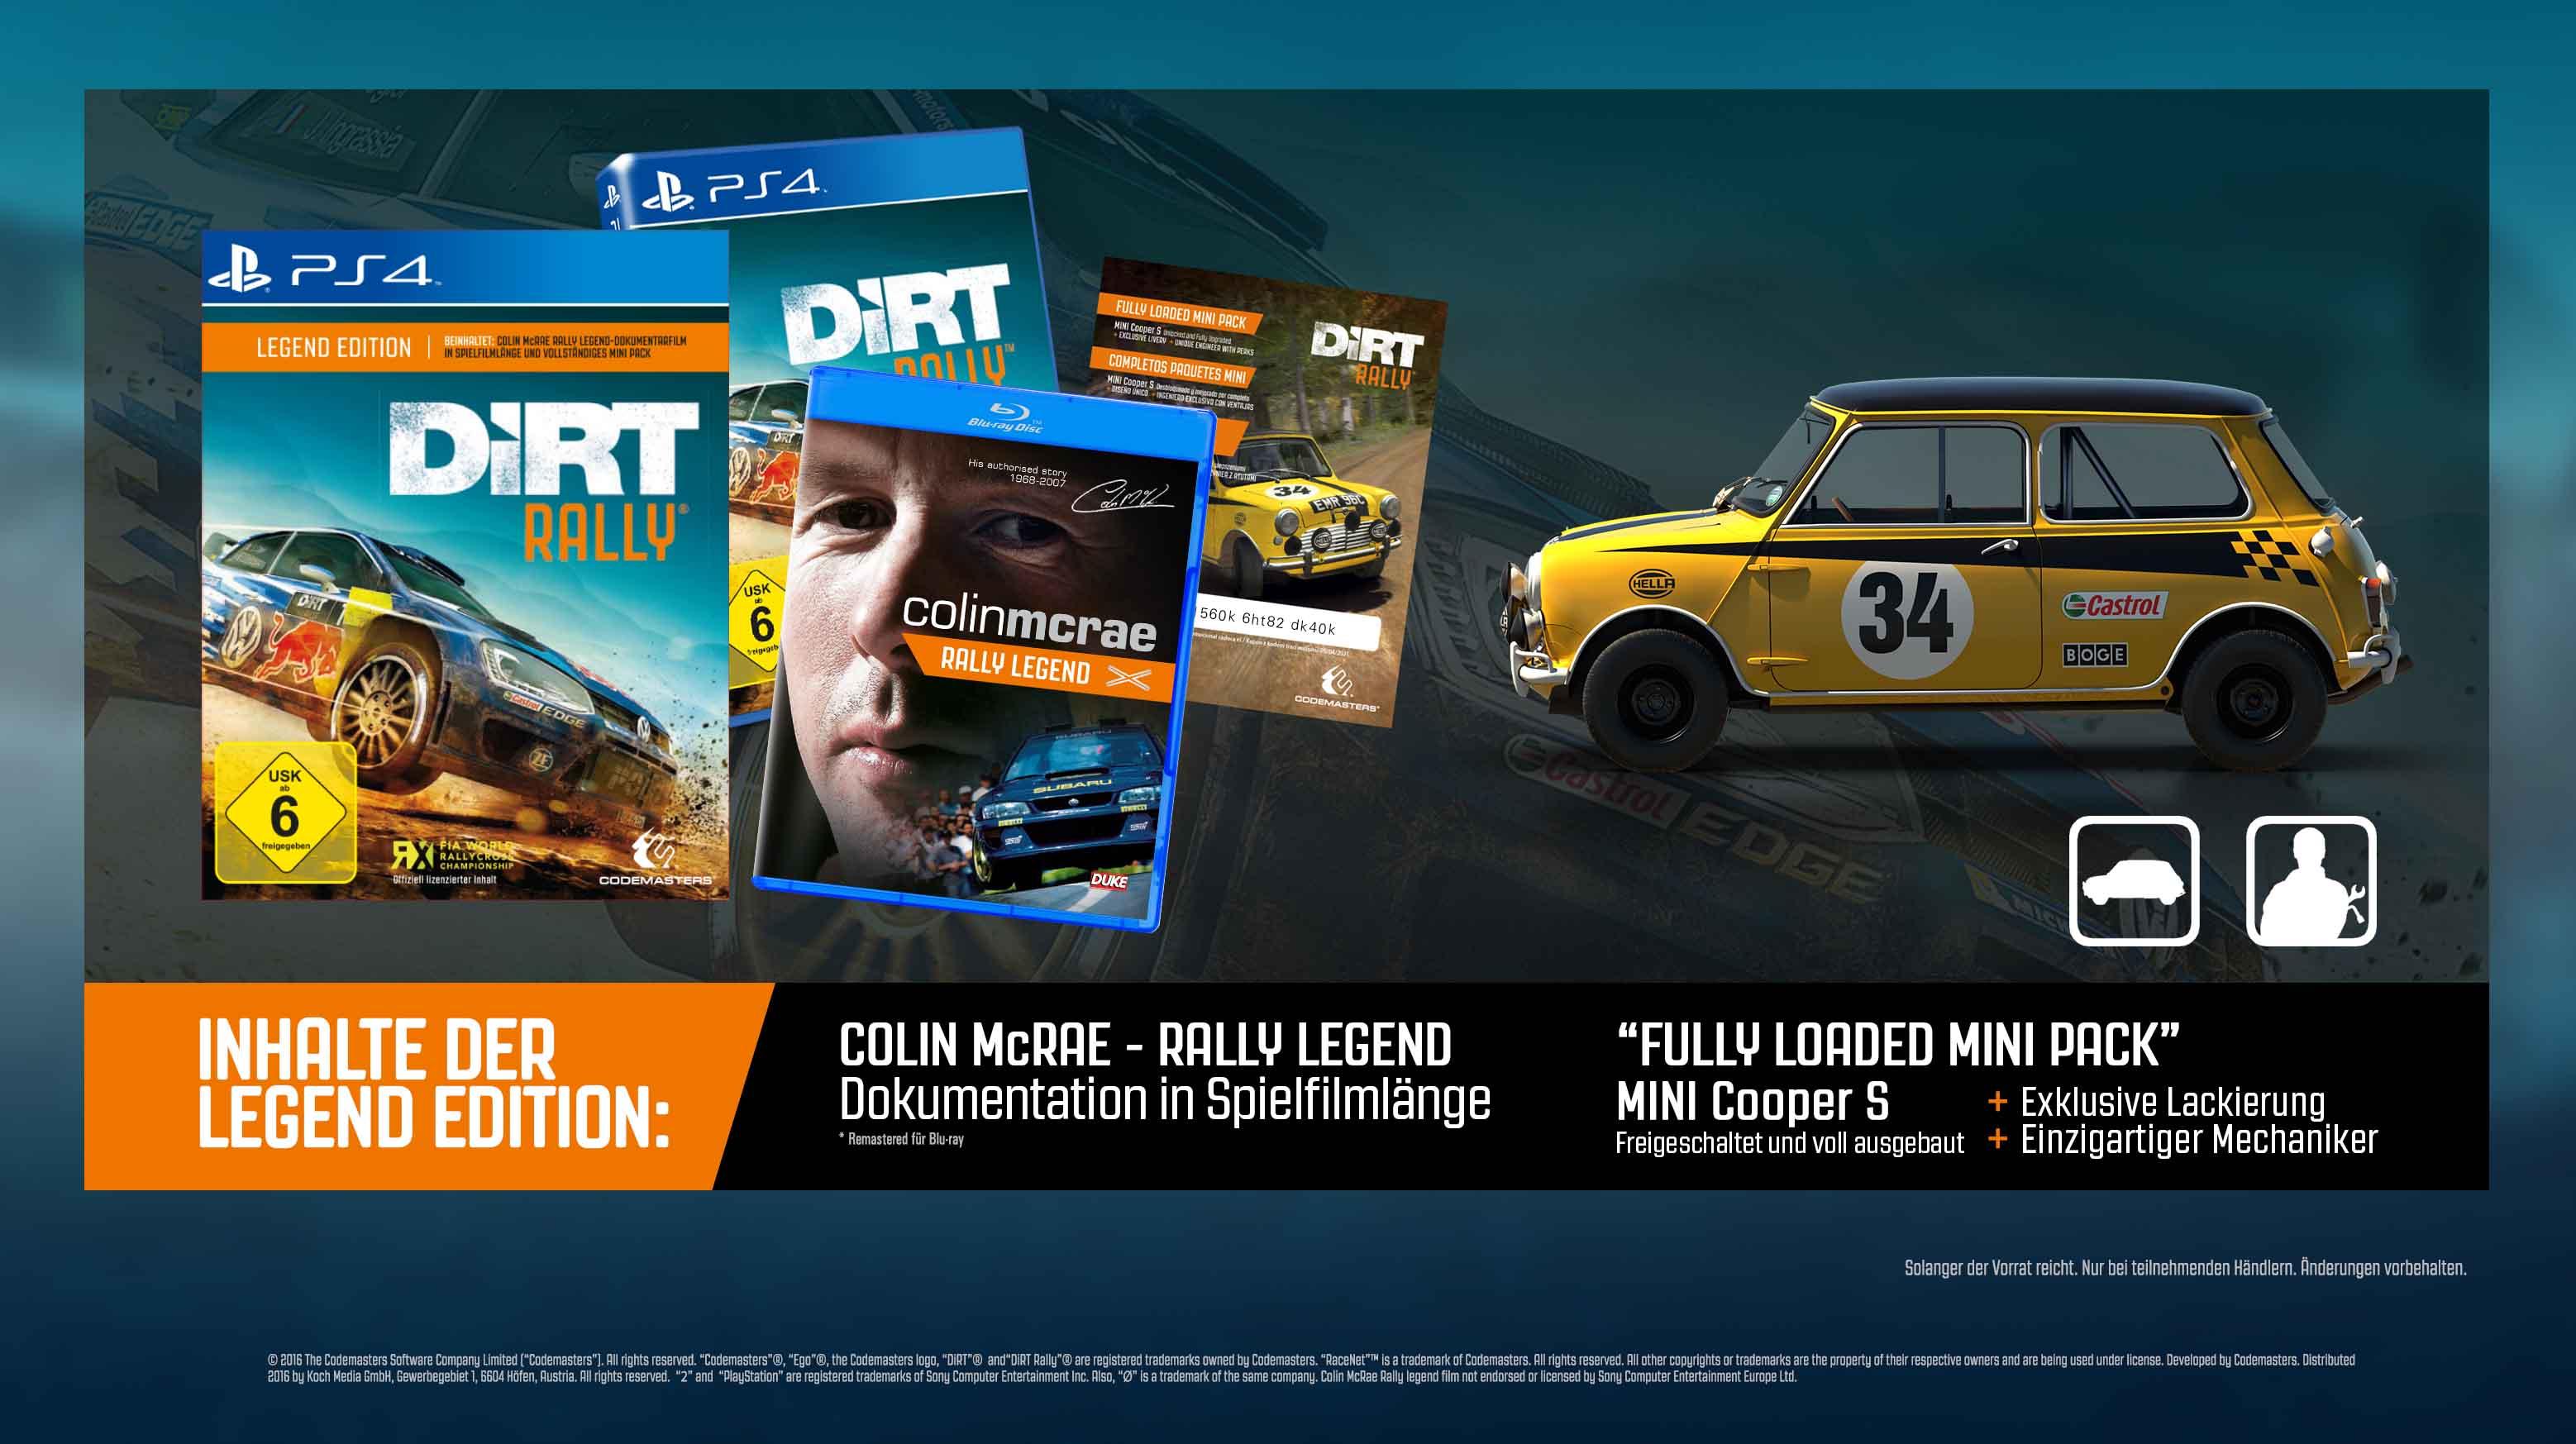 DiRT-RALLY-LEGEND-DE-USK-PS4-nat-games